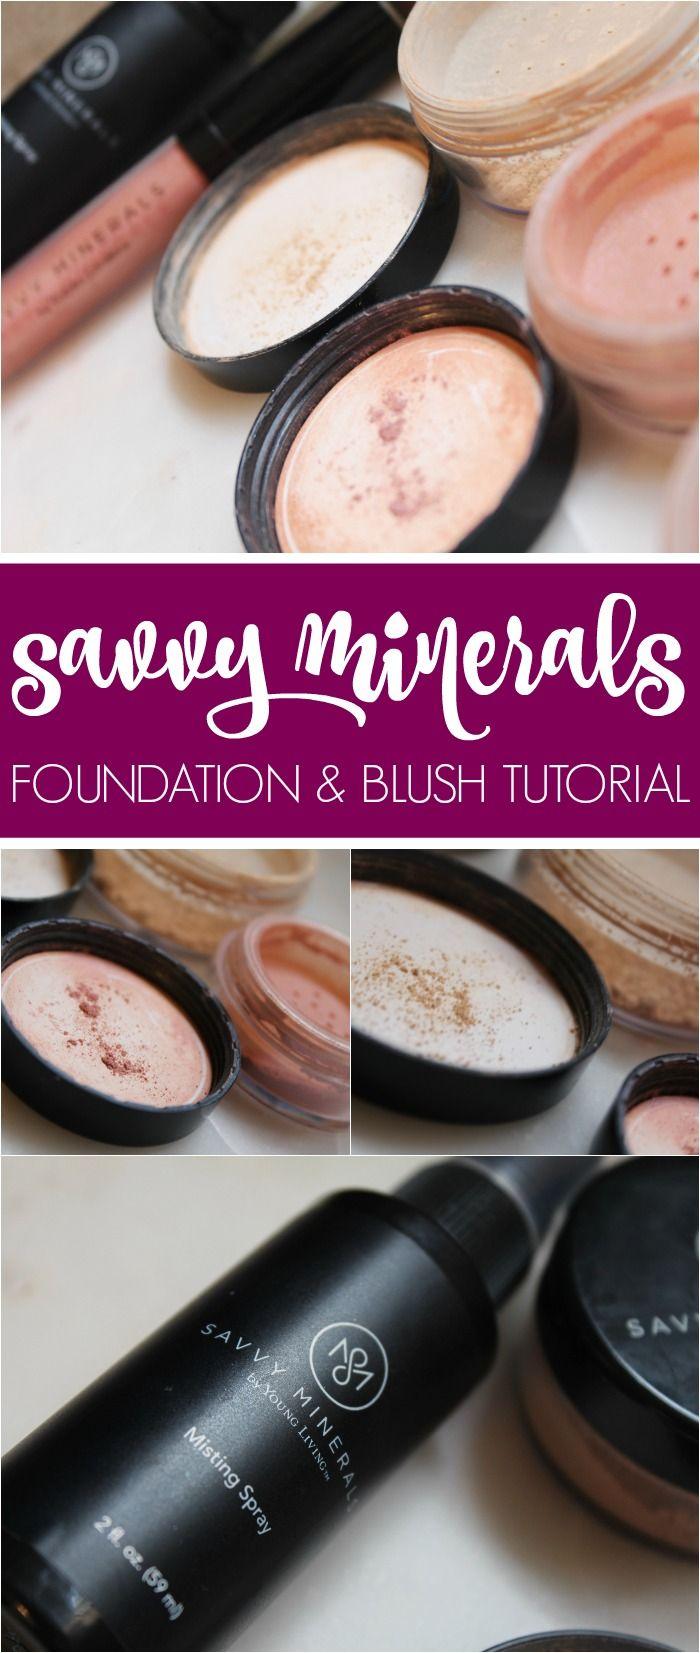 Savvy Minerals Foundation & Blush Tutorial! Savvy